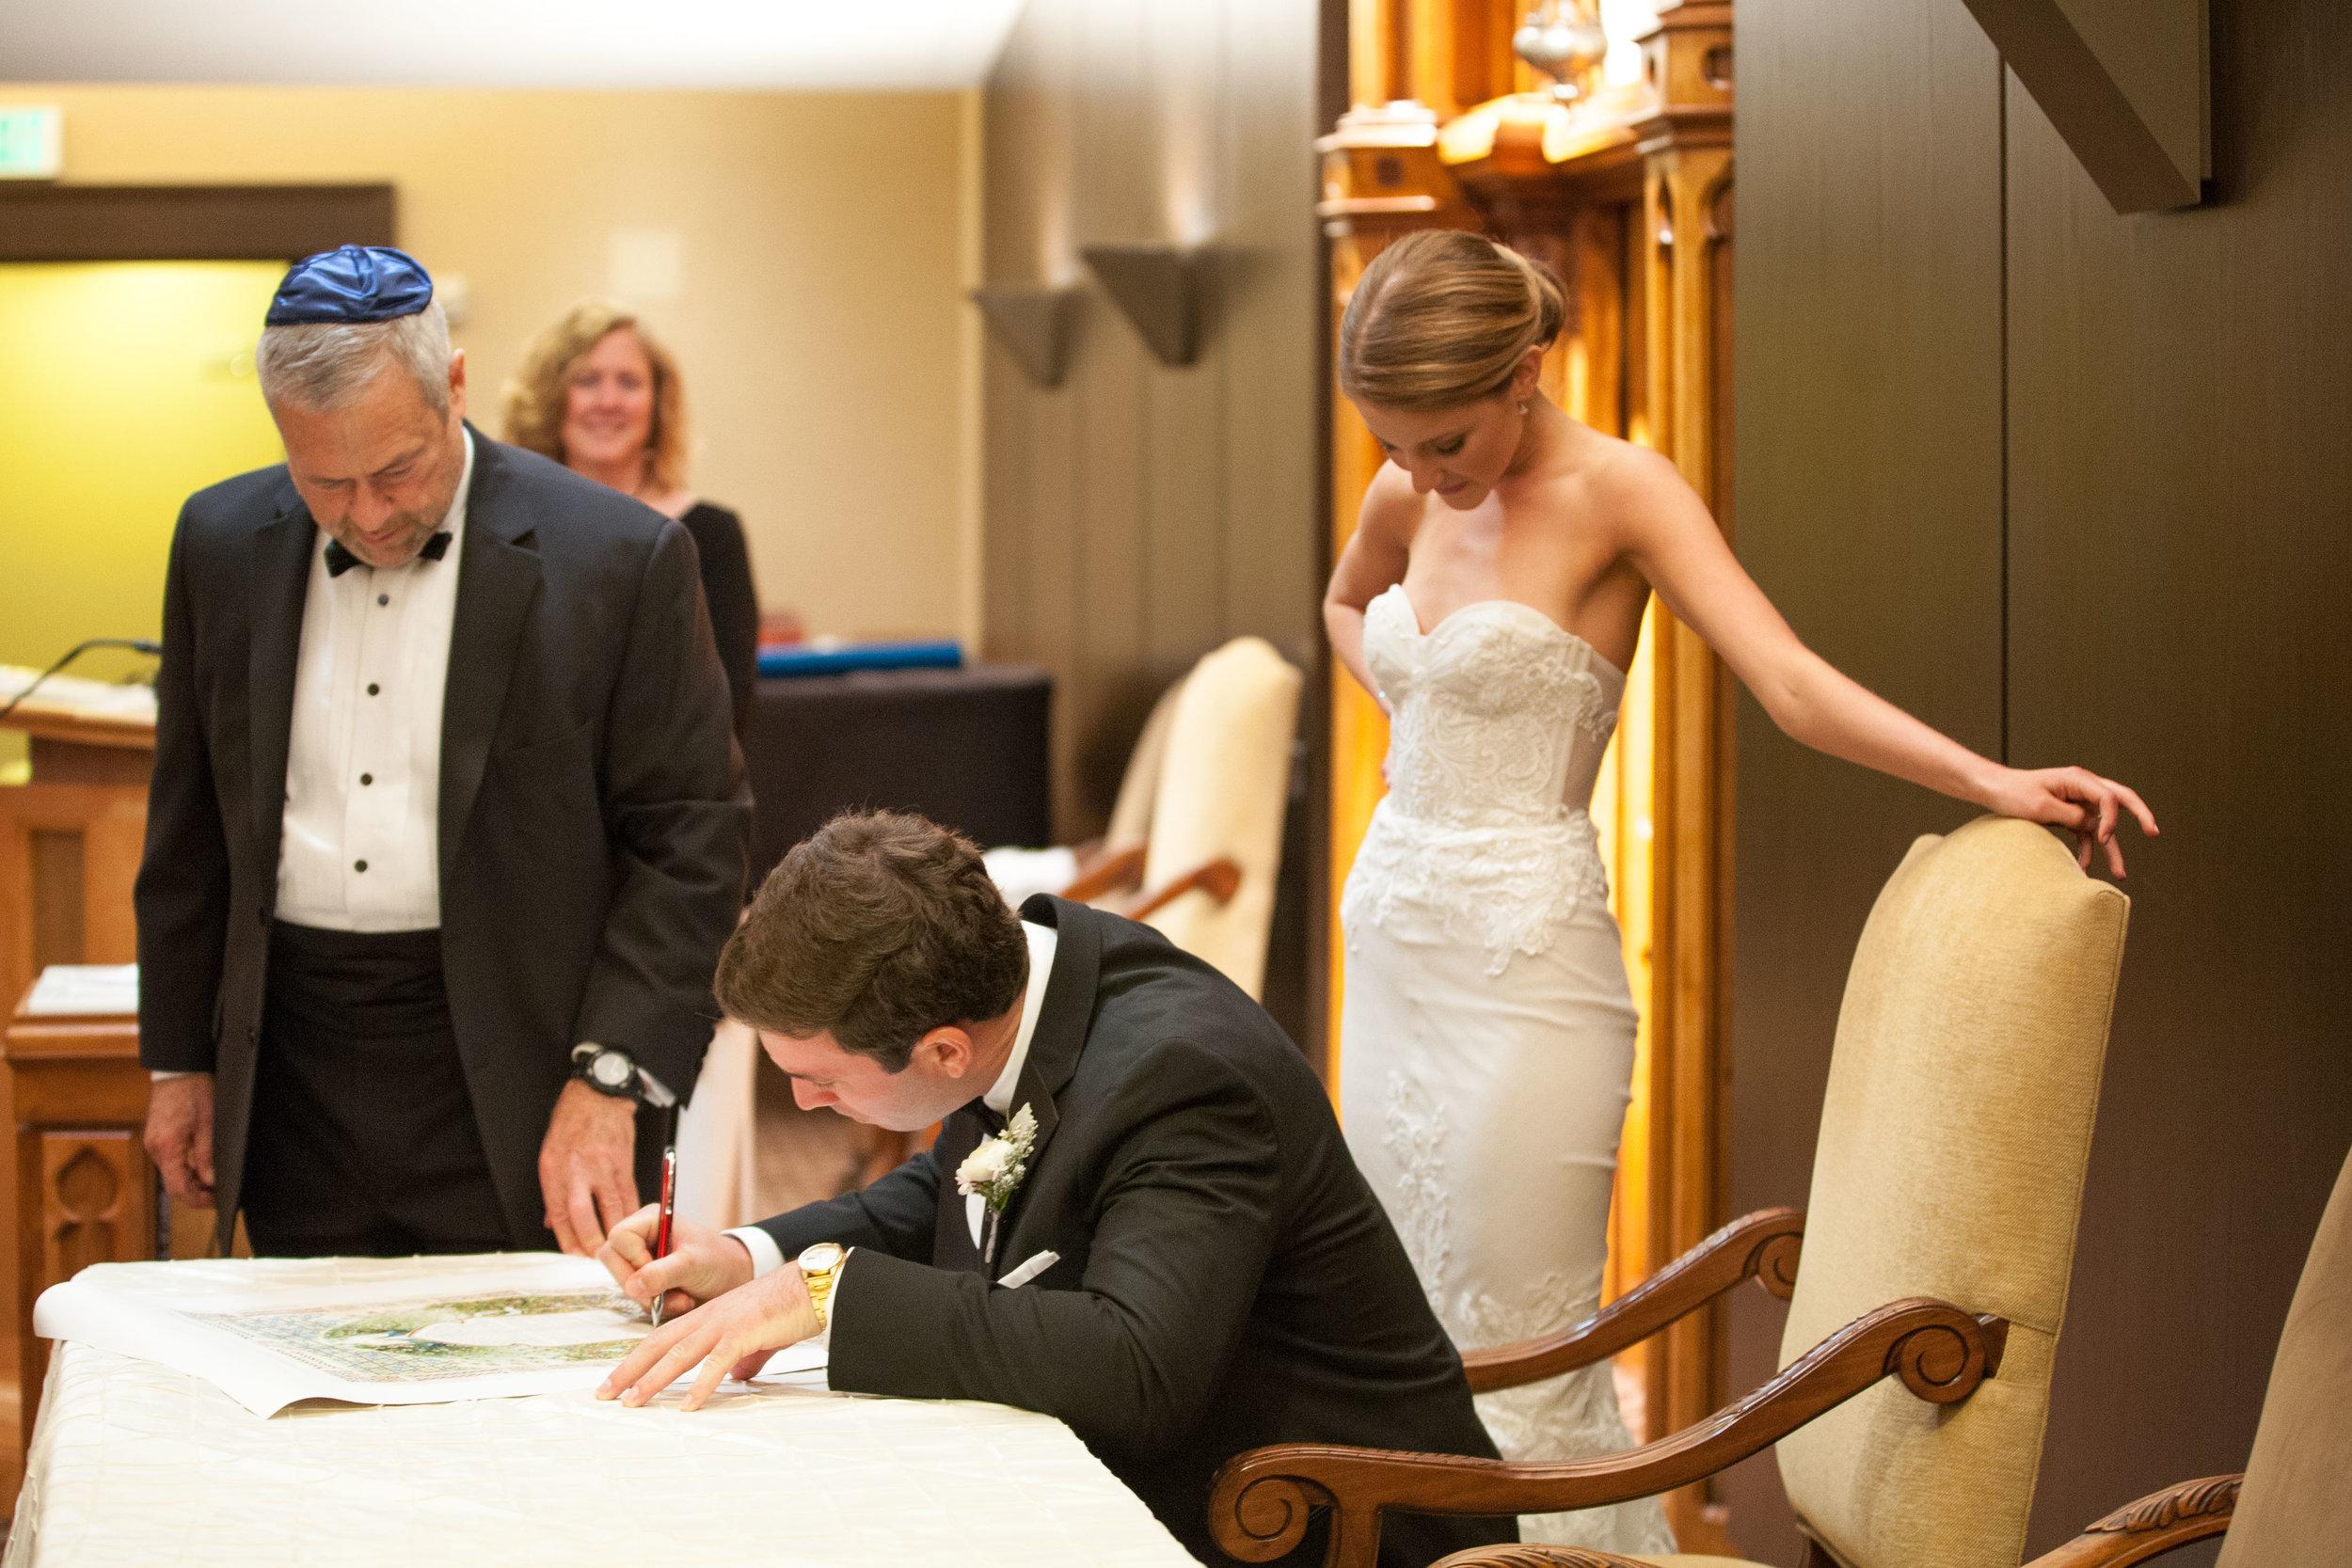 Handley Breaux Designs | Southern Wedding Planner, Southern Wedding, Southern Bride, Alabama Wedding Planner, Alabama Wedding, Alabama Bride, Birmingham Wedding Planner, Birmingham Wedding, Birmingham Bride